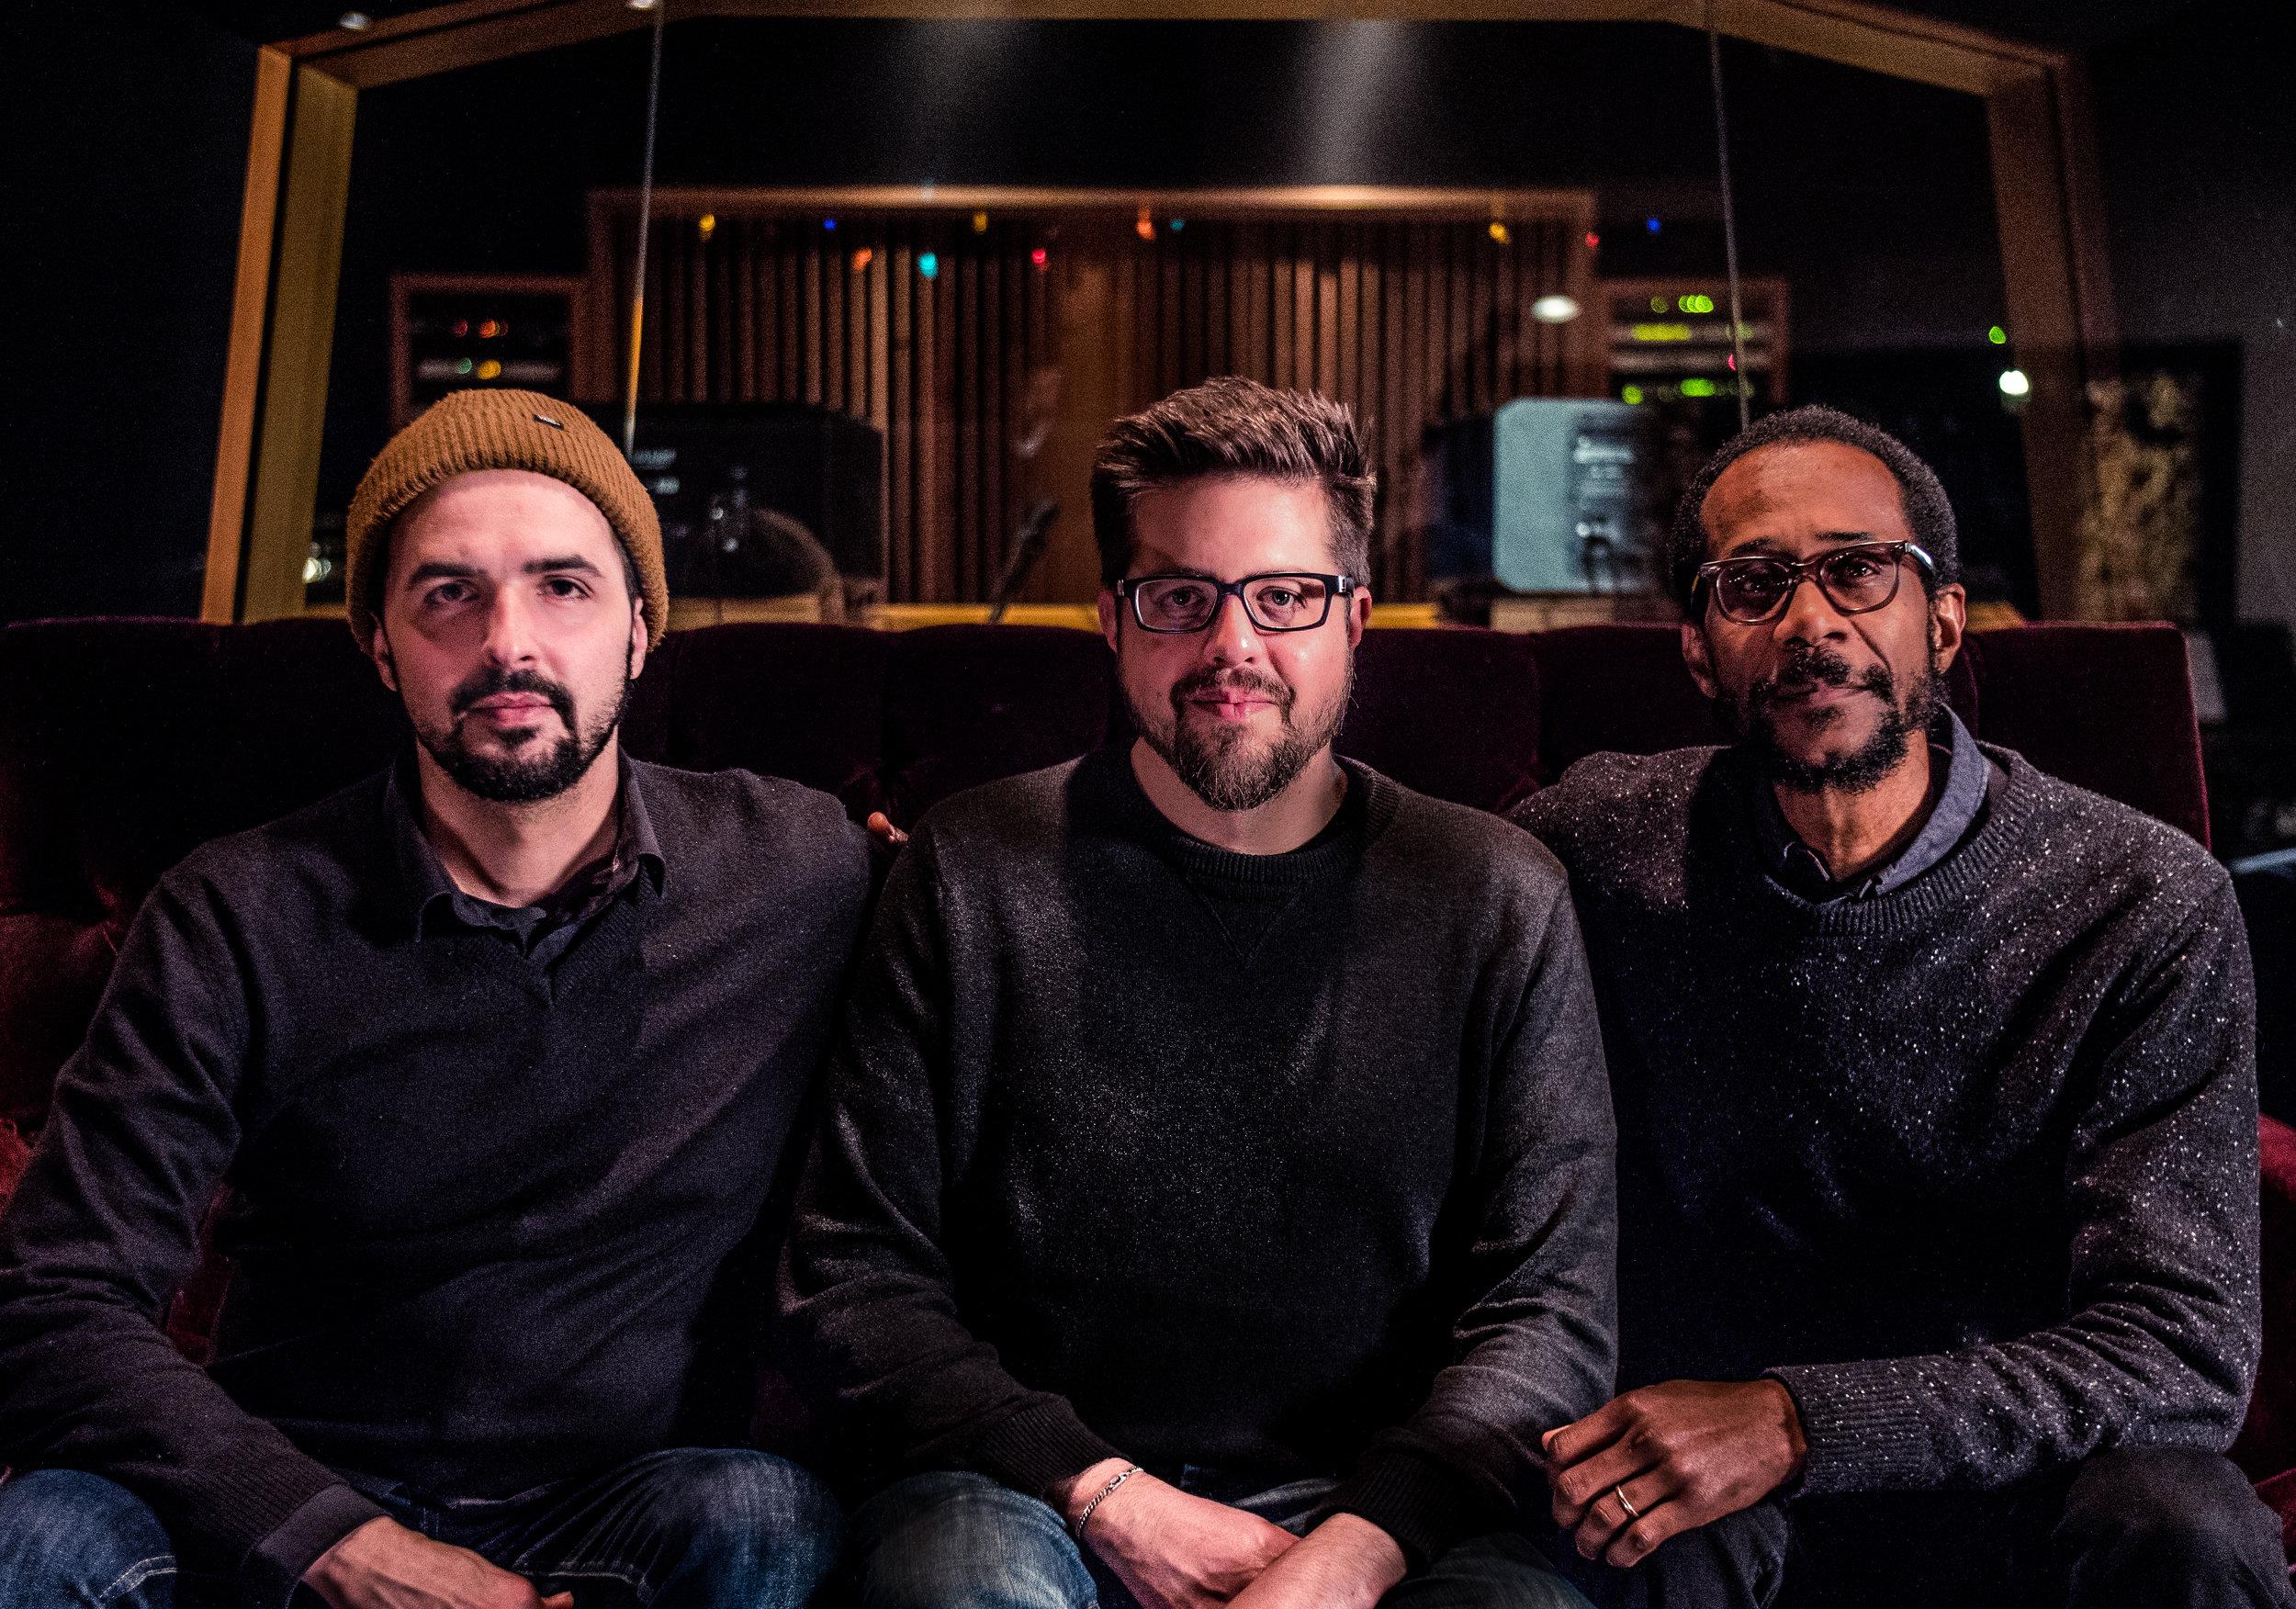 Romain Pilon, Jeff Denson and Brian Blade Photo by Omud Zoufonoun